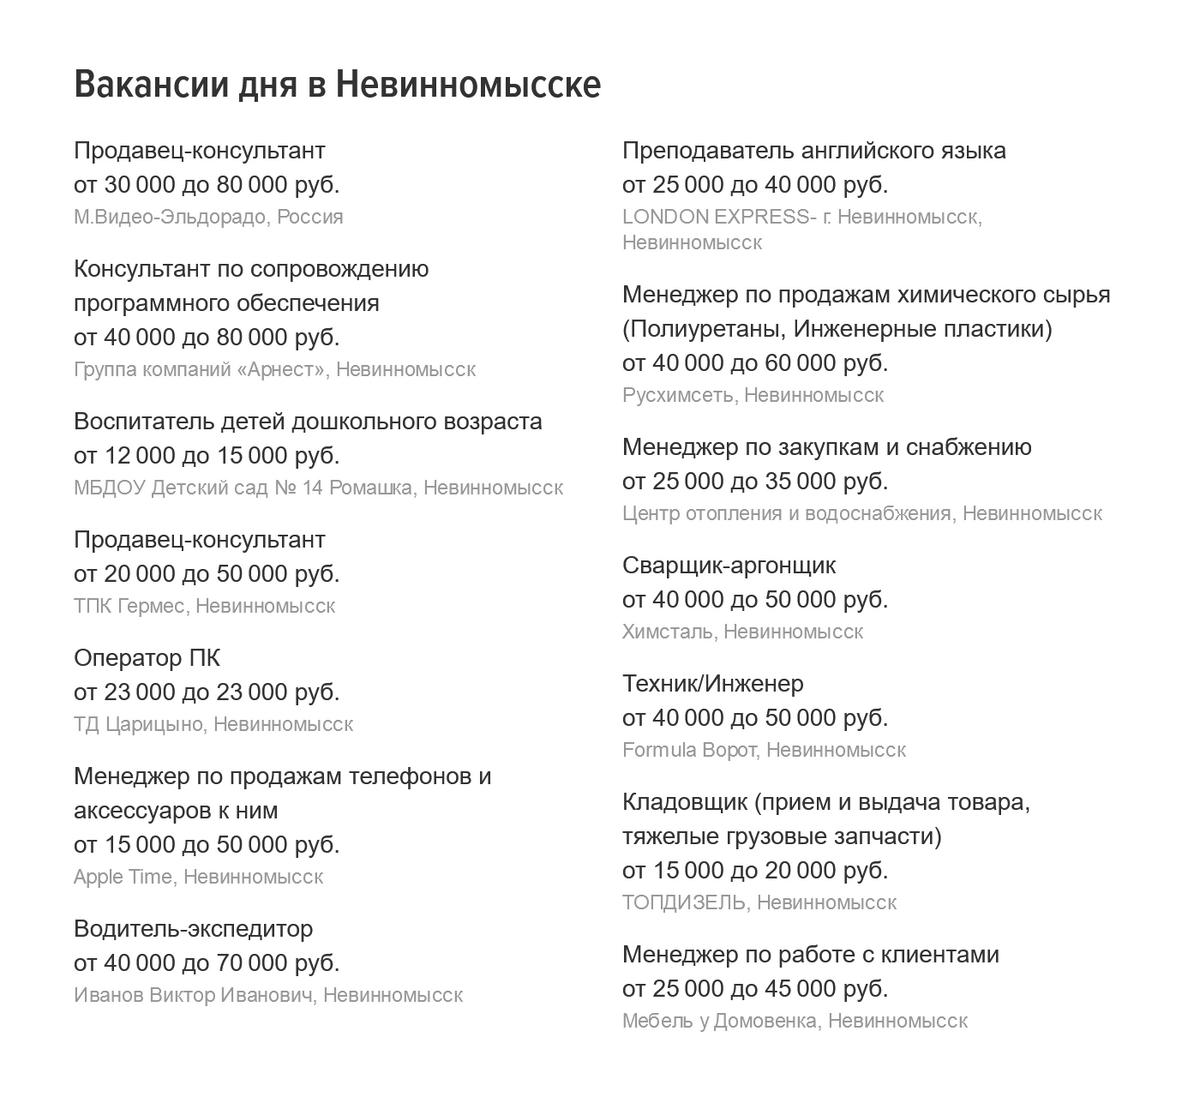 Вакансии дня на «Хедхантере»: в среднем соискателям предлагают 20 000—40 000<span class=ruble>Р</span>